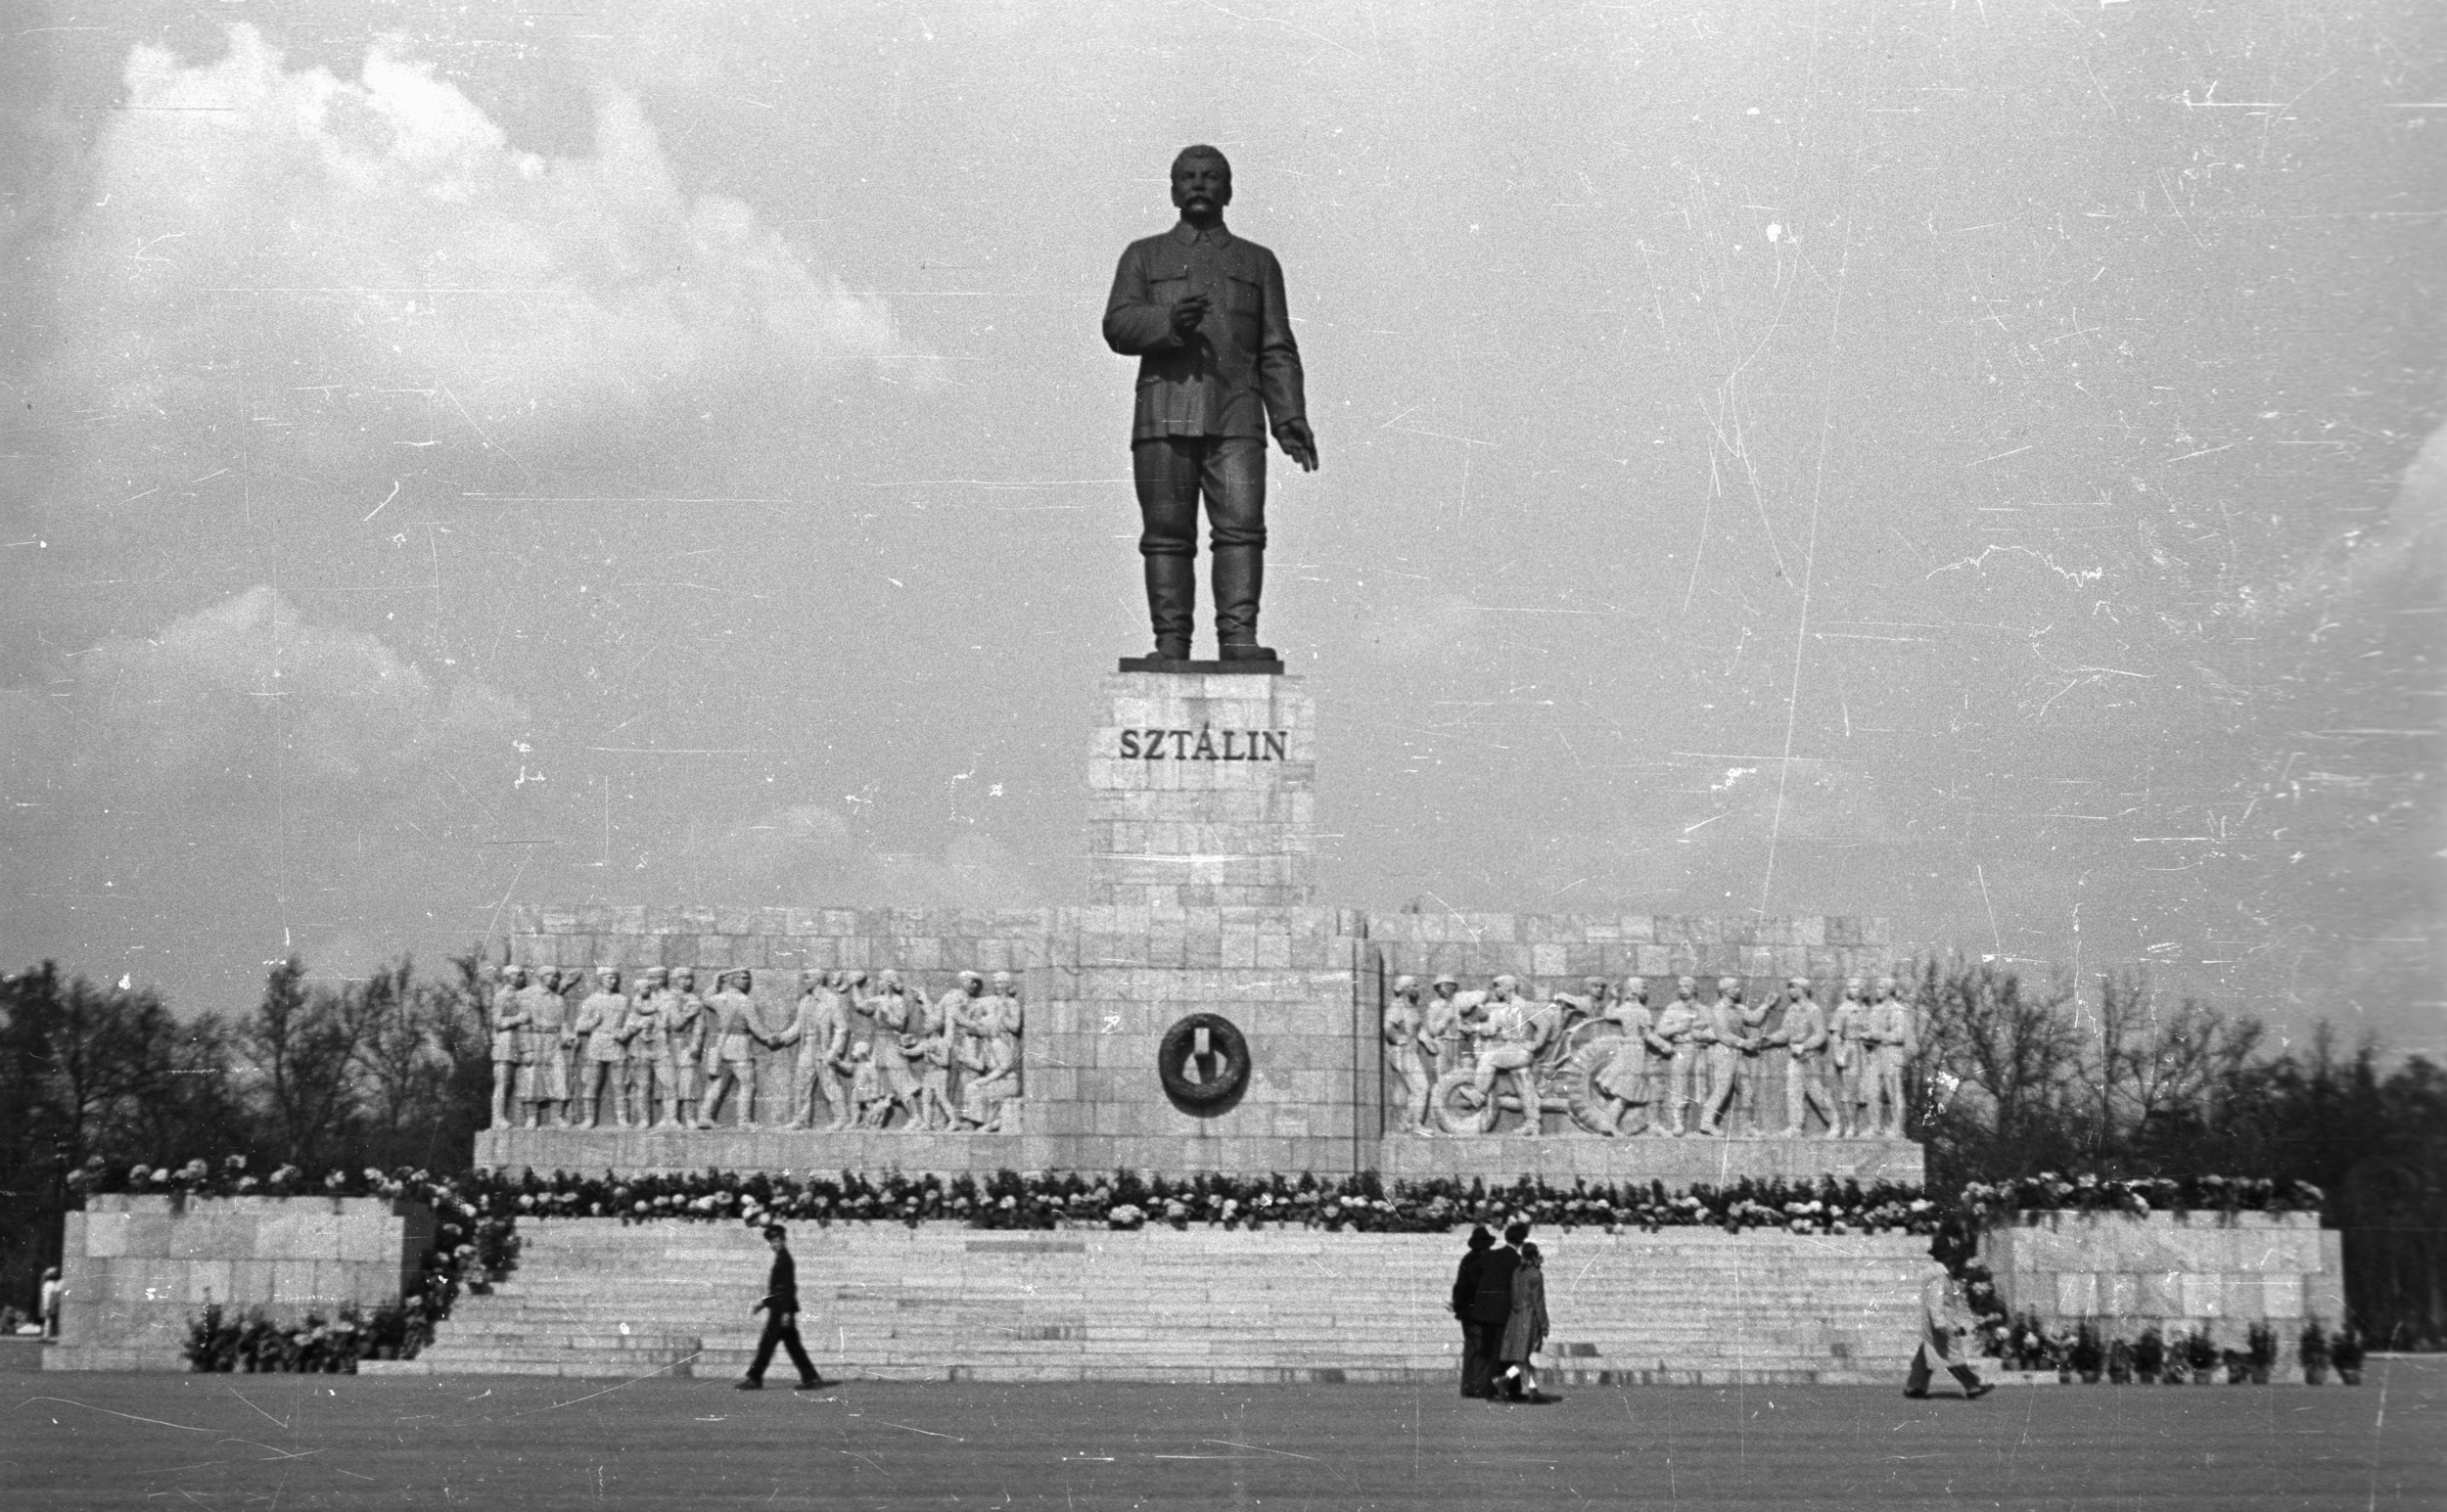 Statue of Stalin in Budapest, 1953. Hungary.Photo: Gyula Nagy / Wikimedia Commons / CC-BY-SA-3.0.